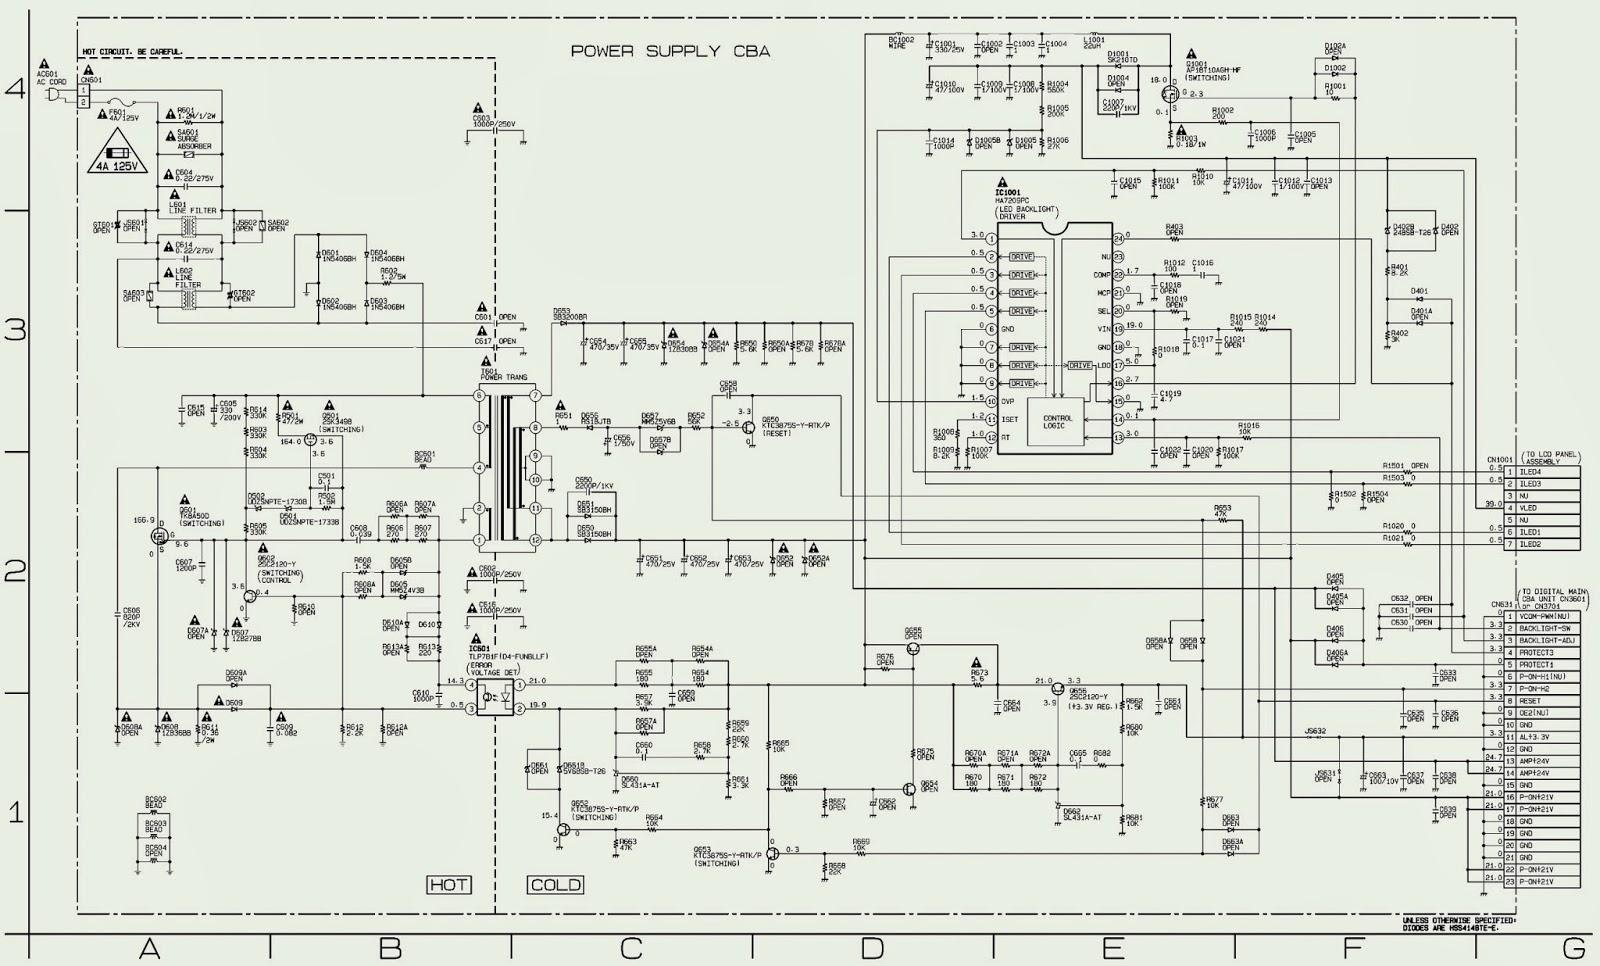 smoke alarm wiring diagram xbox 360 controller wire philips tv circuit – readingrat.net